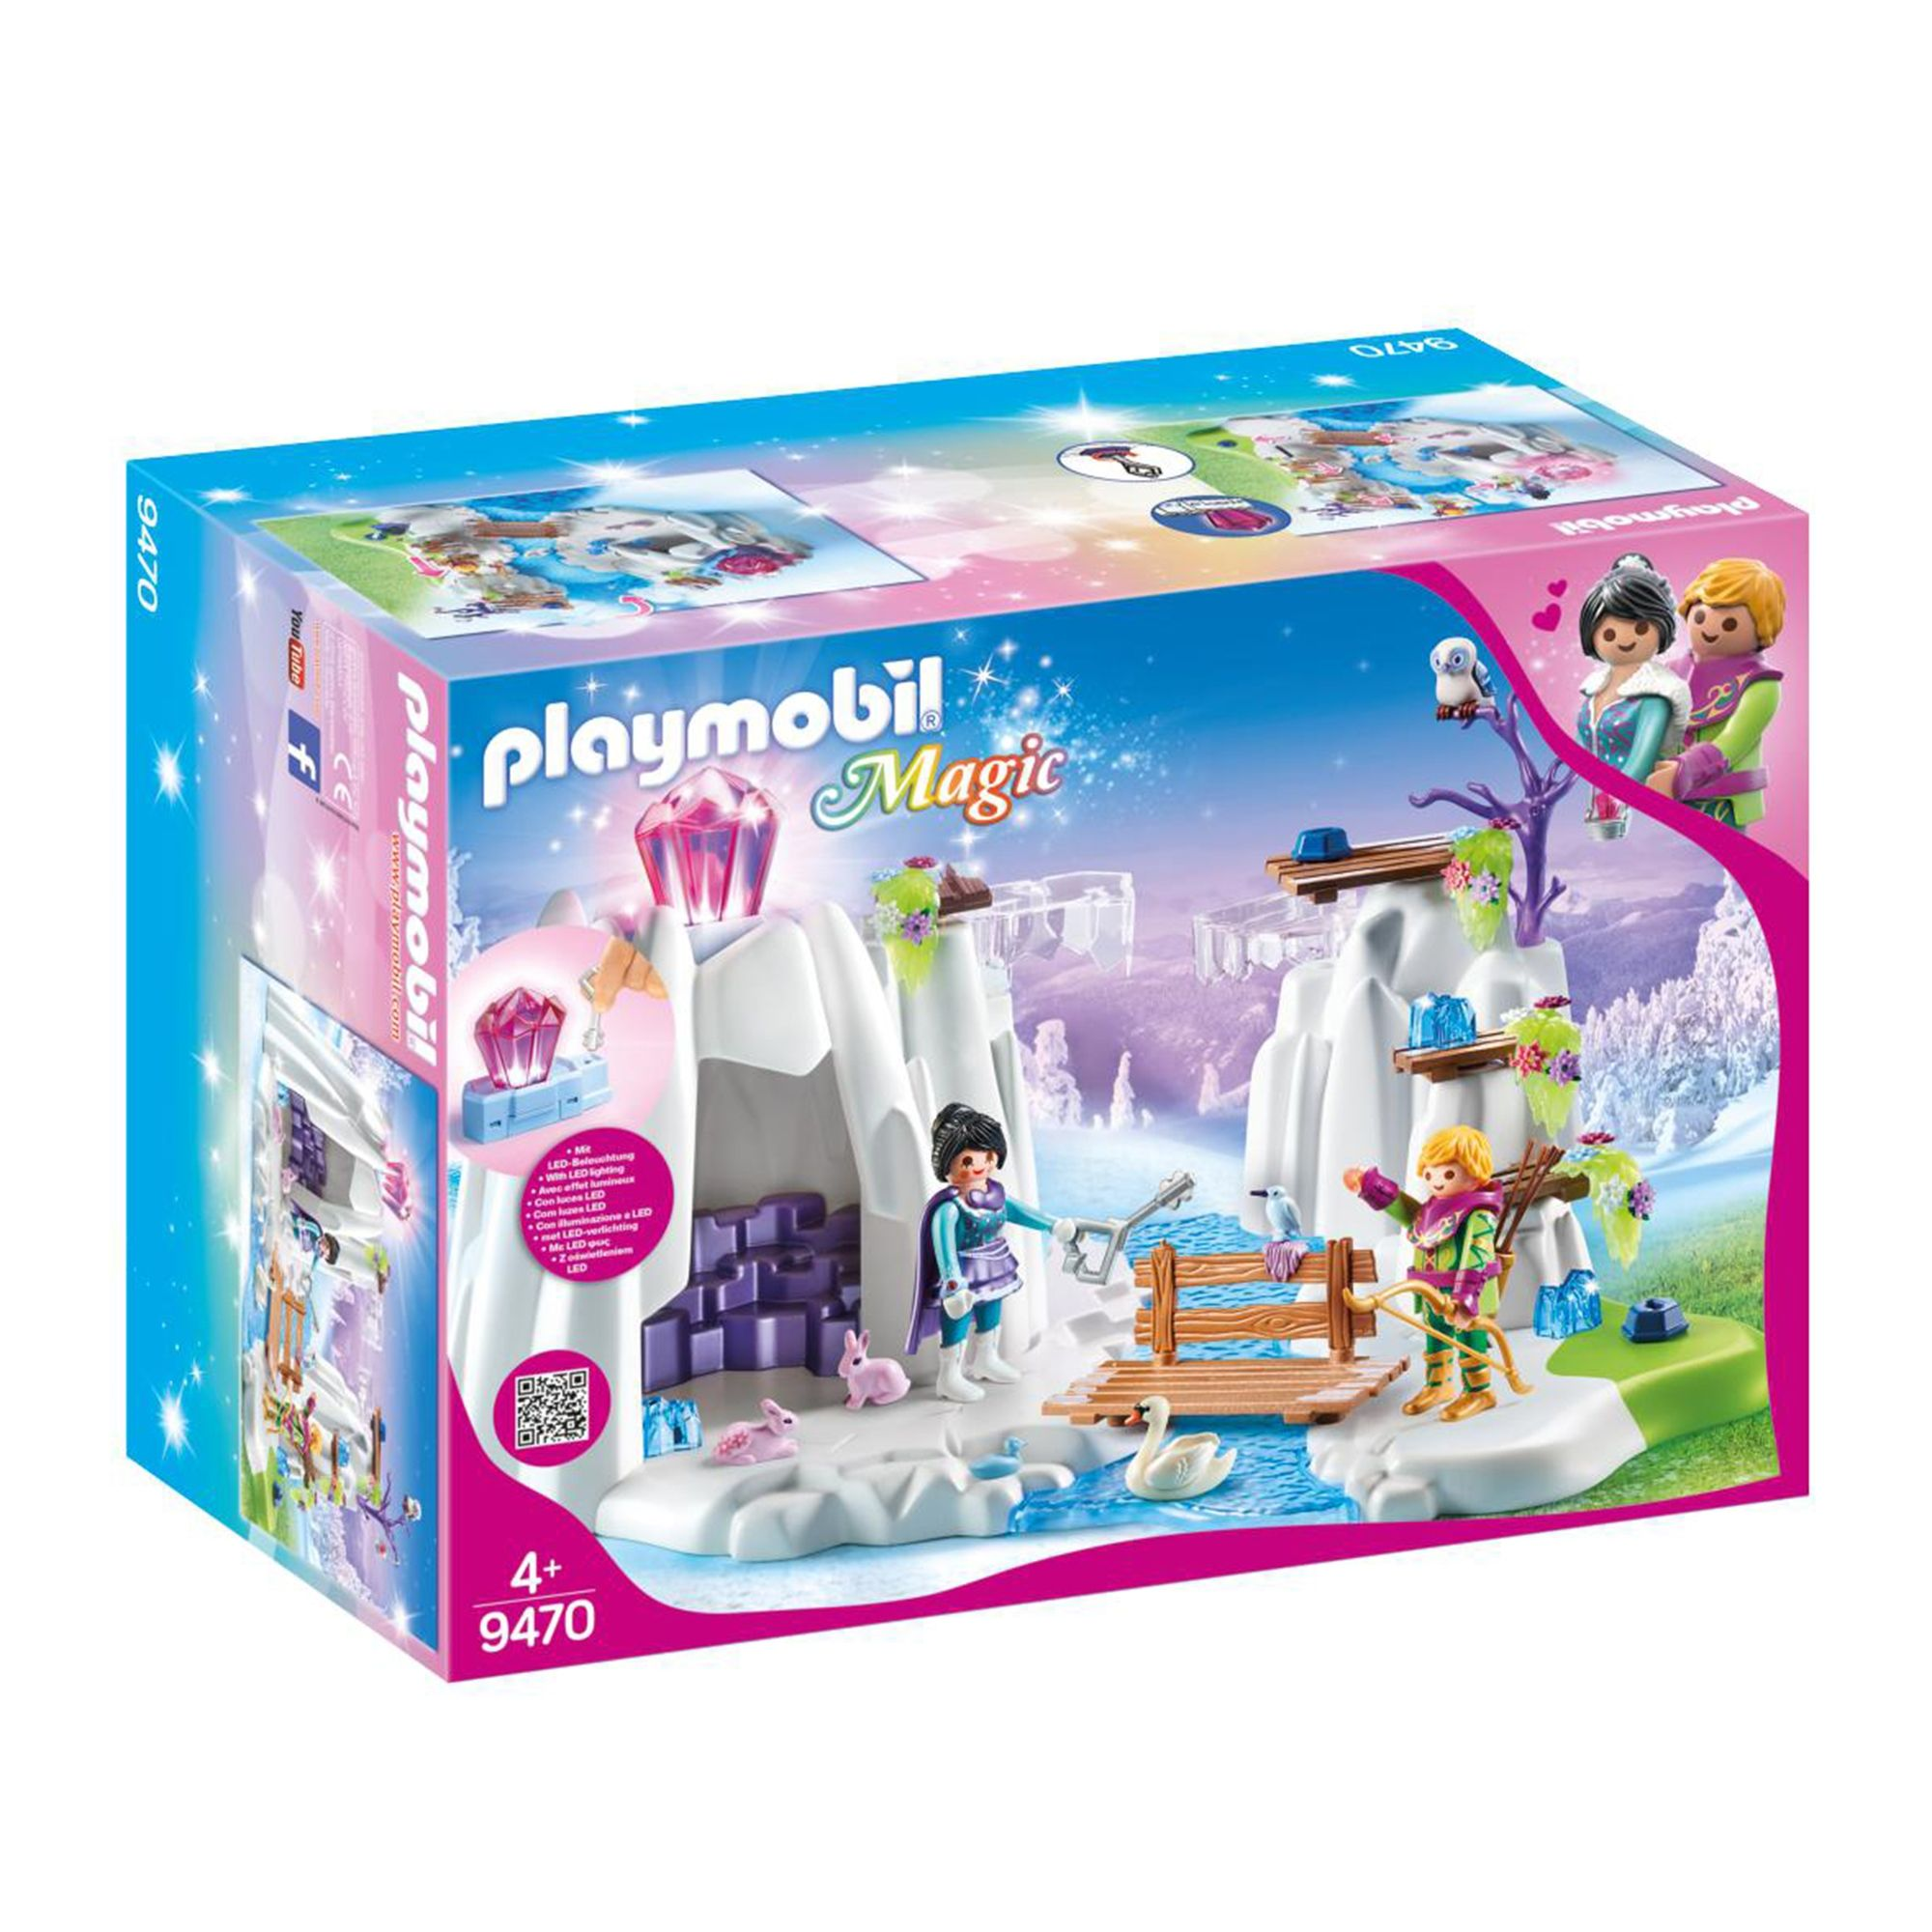 Playmobil 9470 Magic Crystal Diamond Hideout With Shiny Crys Playmobil Diamond Crystal Playset